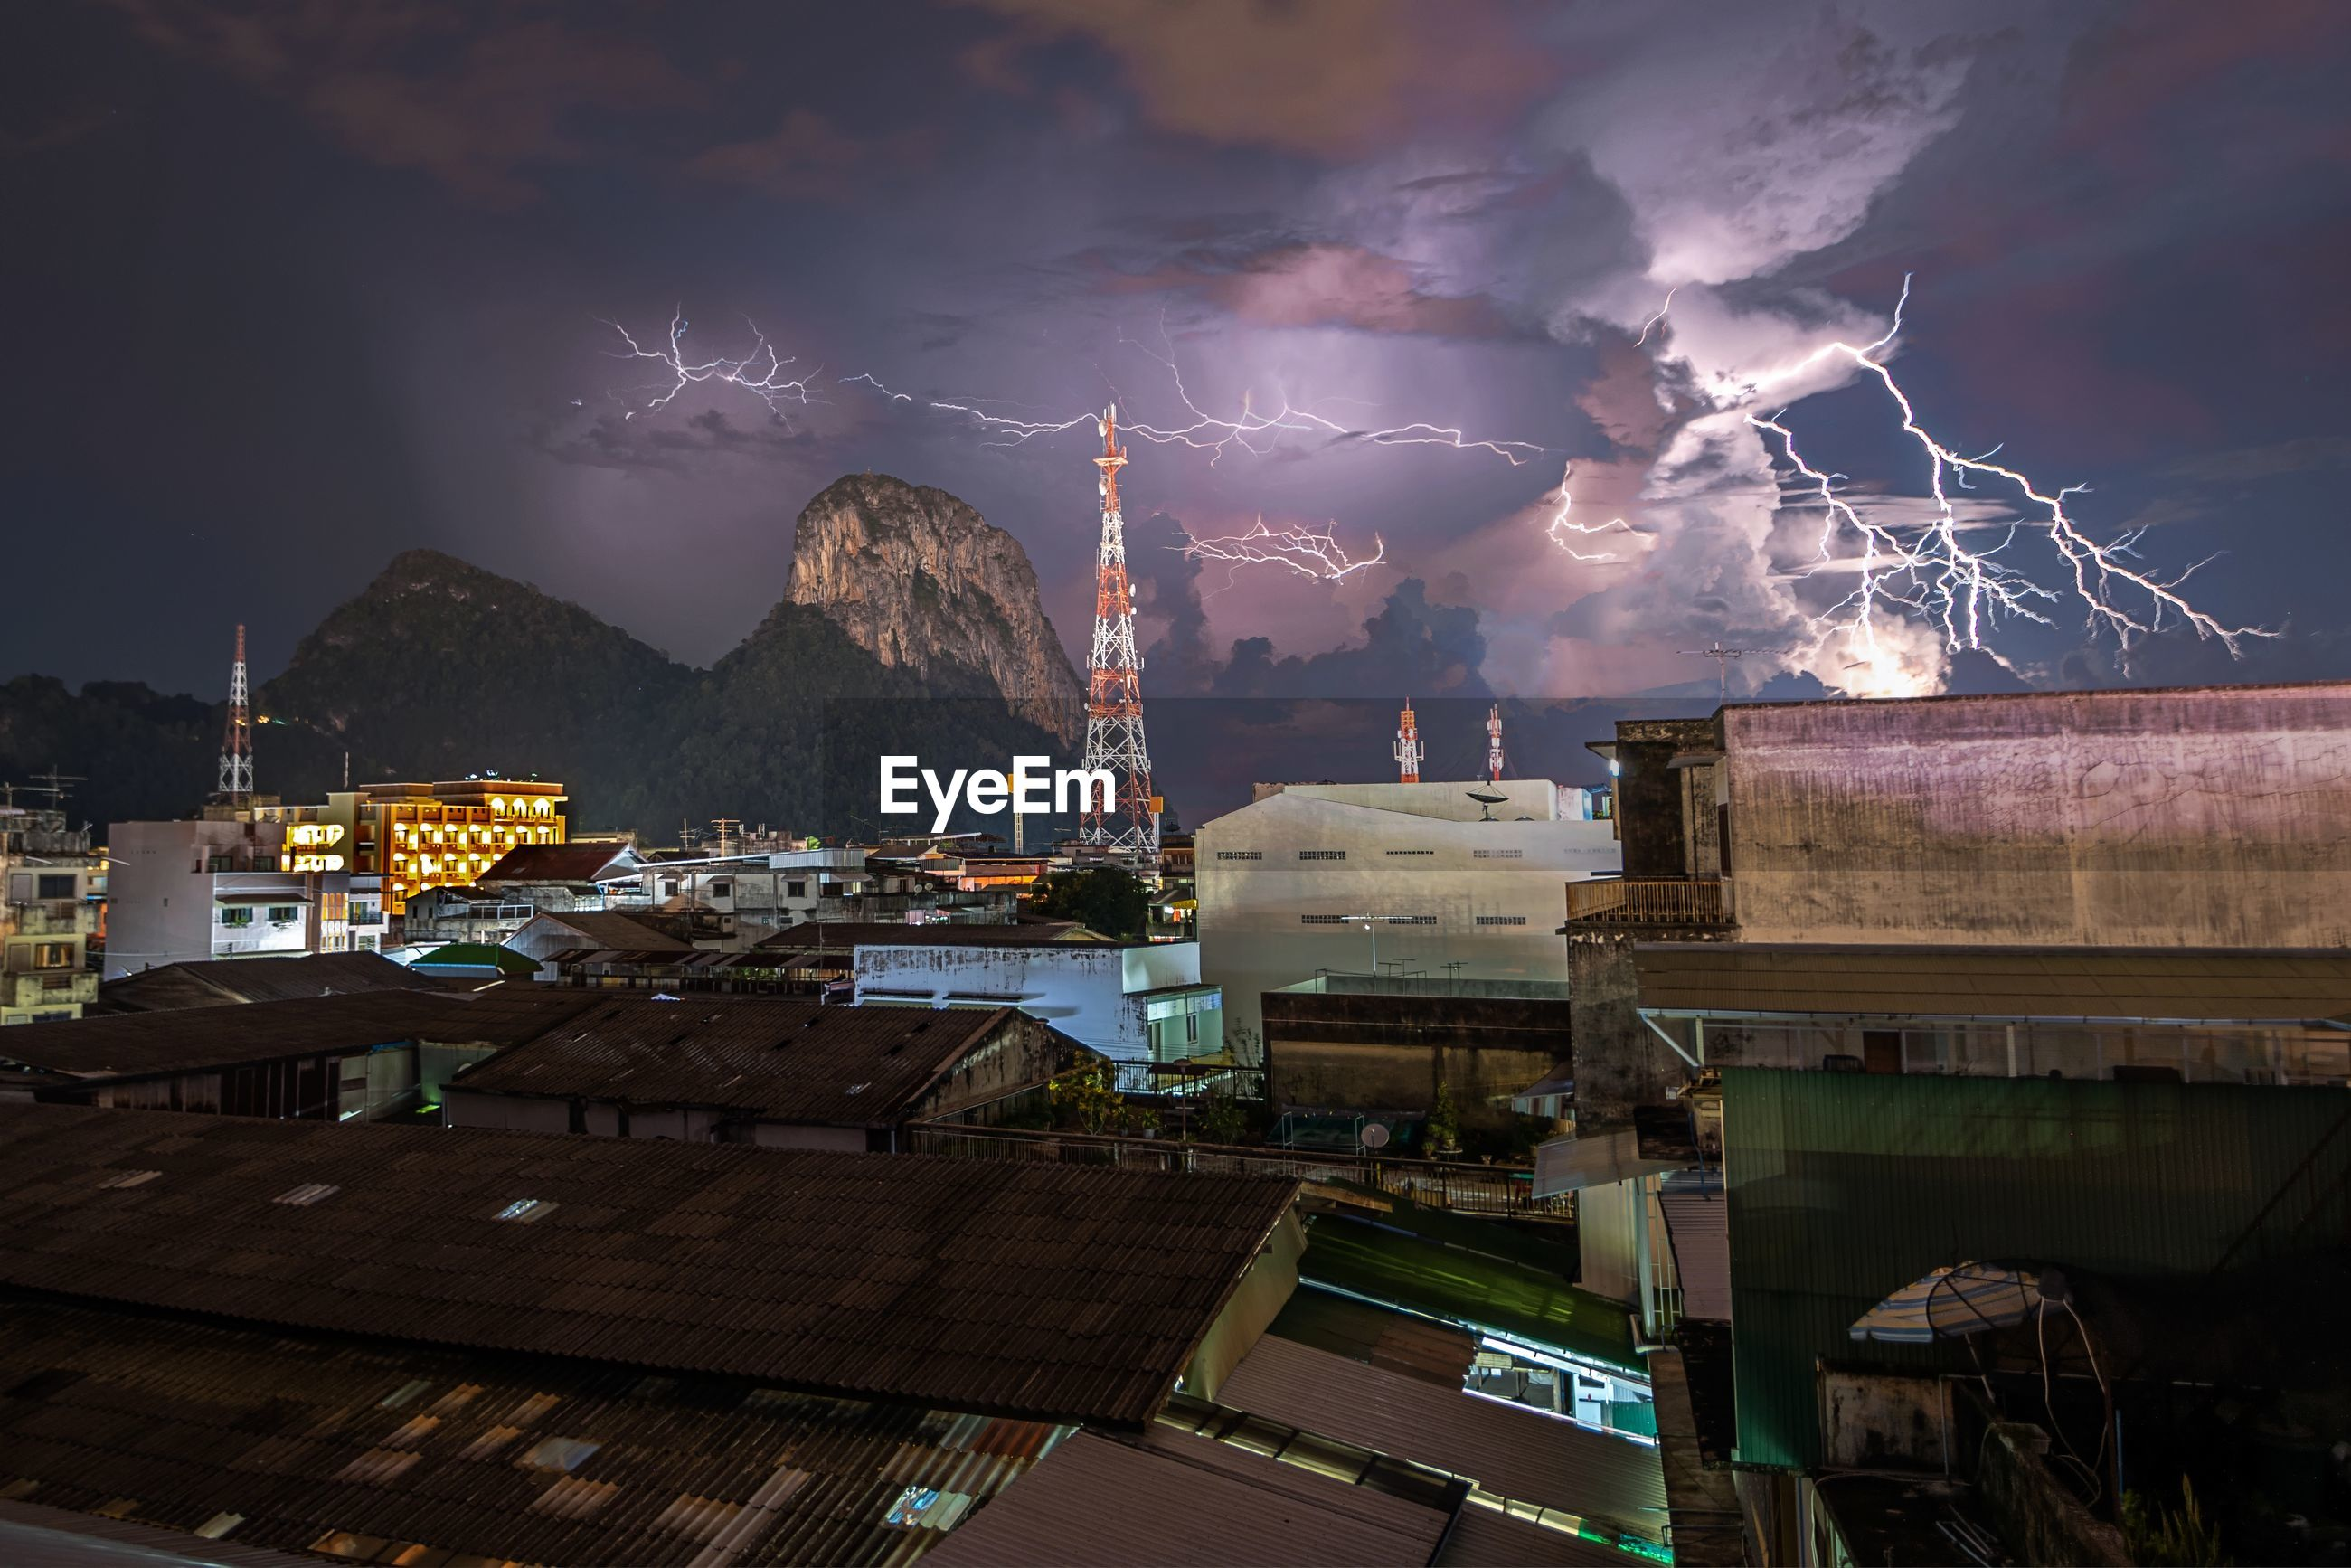 PANORAMIC VIEW OF ILLUMINATED CITY AGAINST SKY